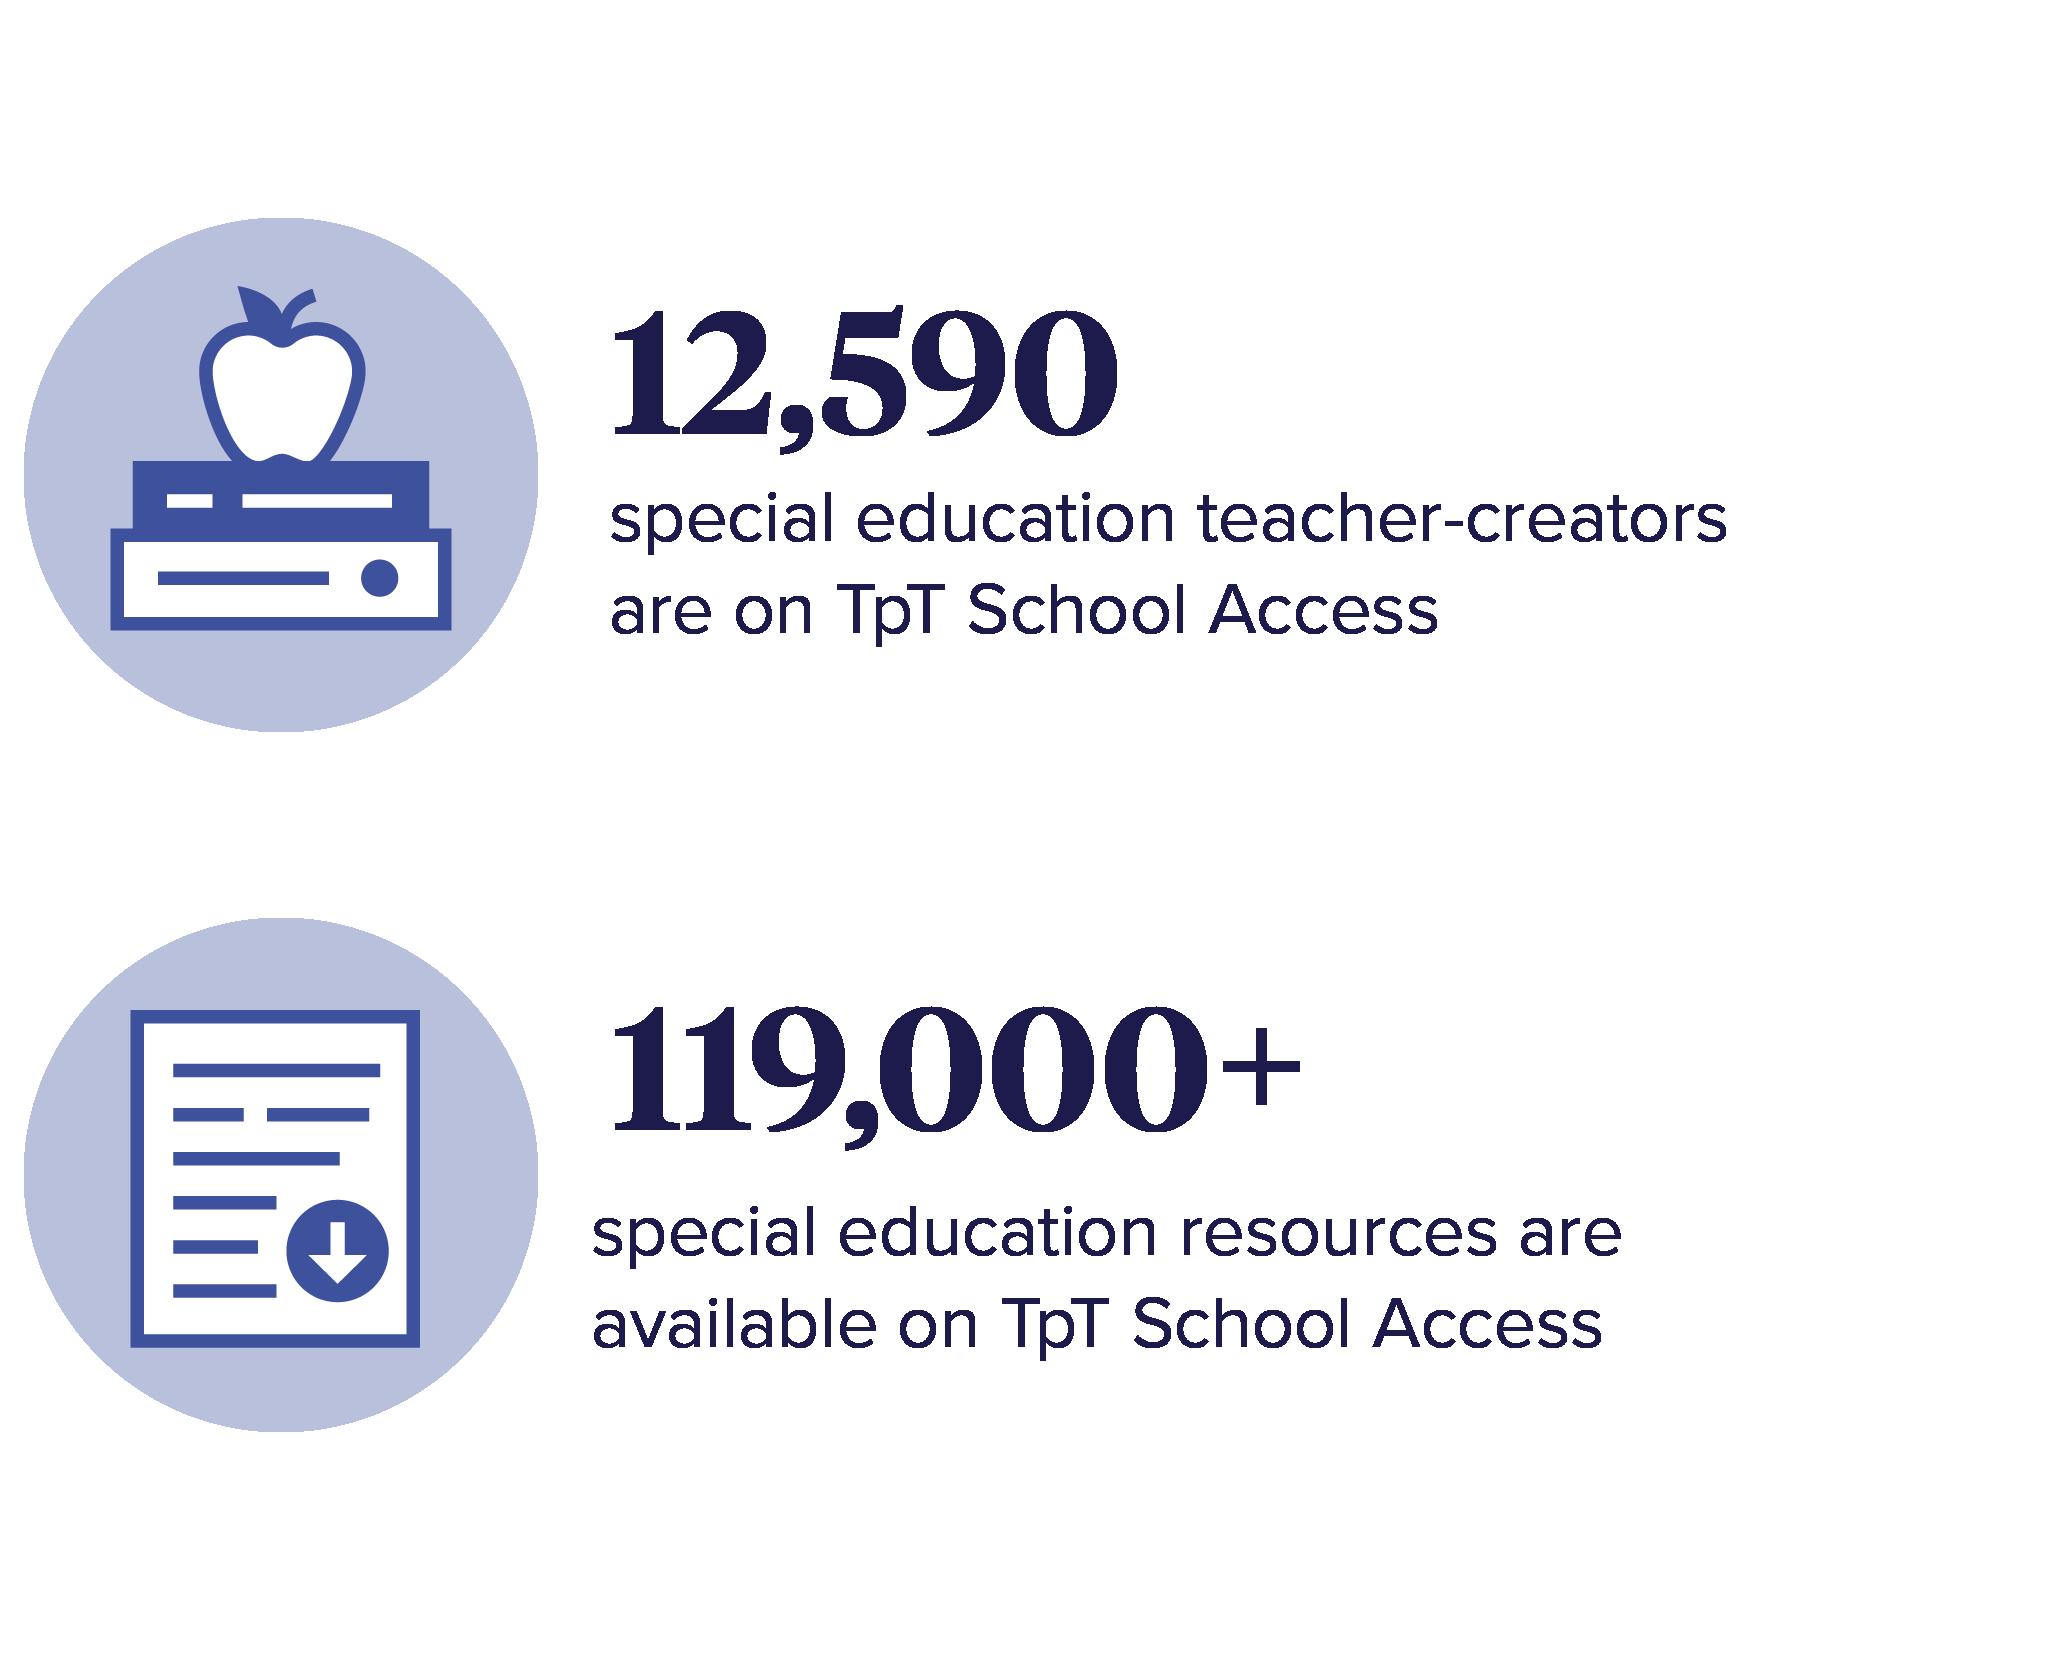 12,590 special education Teacher-Creators are on TpT School Access. 119,000+ special education resources are available on TpT School Access.